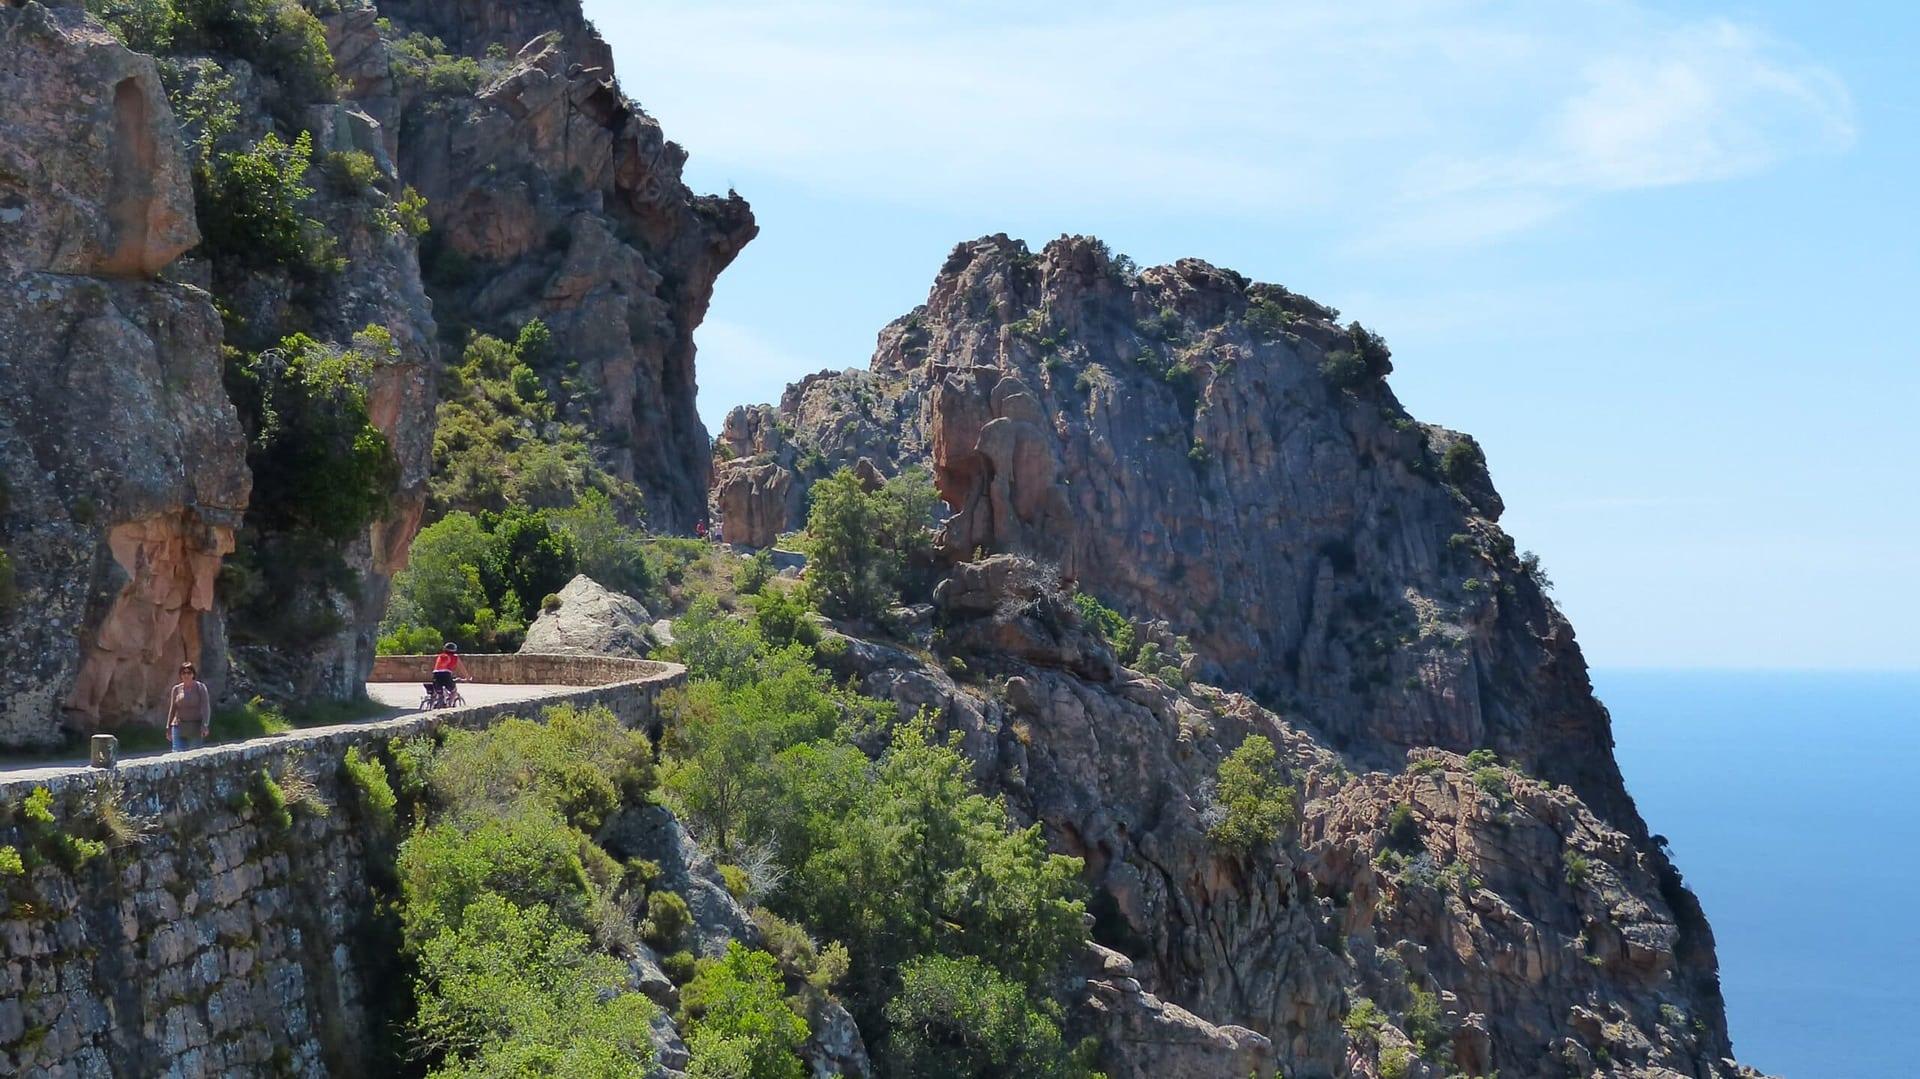 Radreise Korsika geführte Radtour